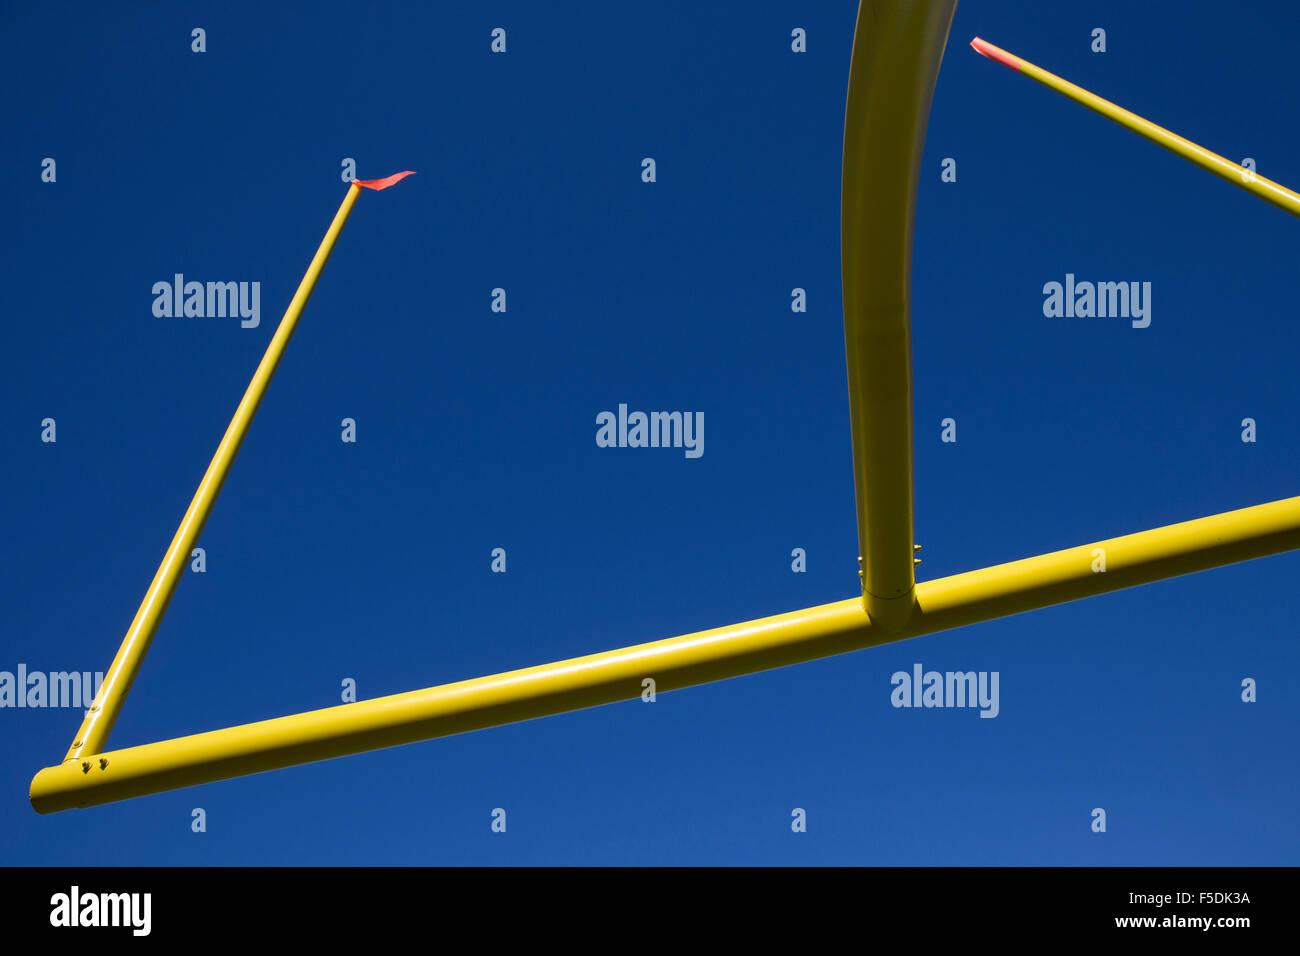 Poteau de but de football américain Photo Stock